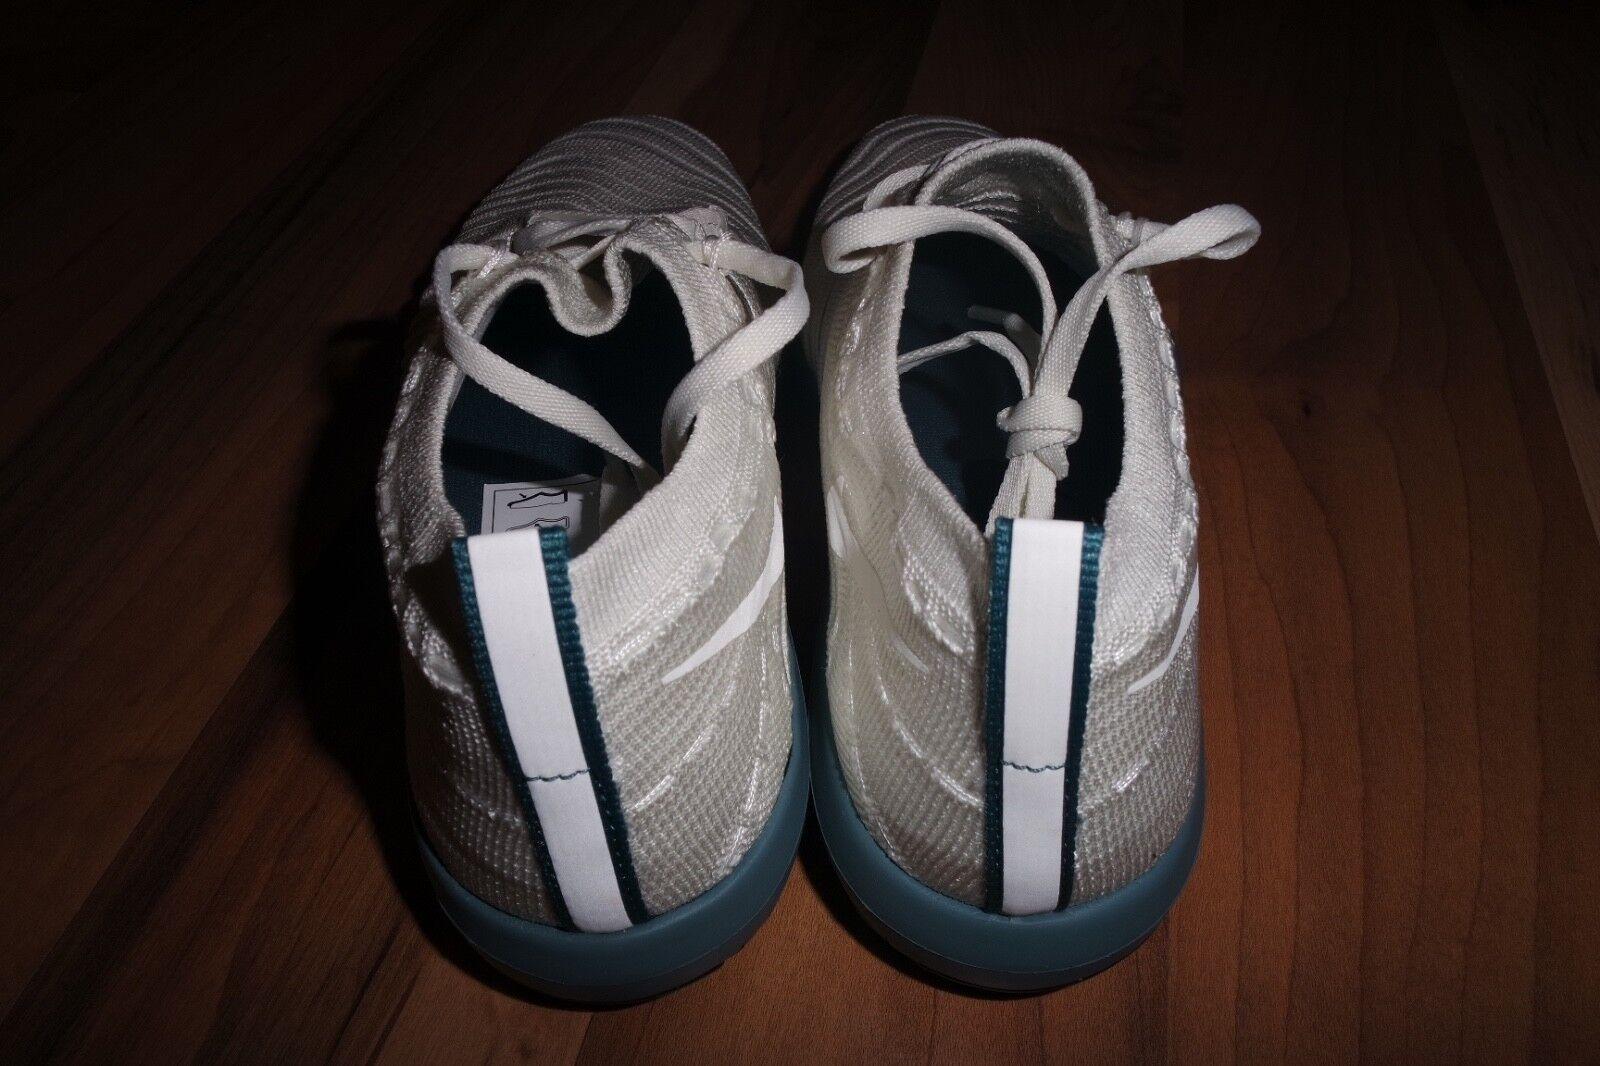 Nike NikeLab Free Transform FK  Running  Shoes Trainers 878552 100  Running US 5 EU 35.5 a4dbfa